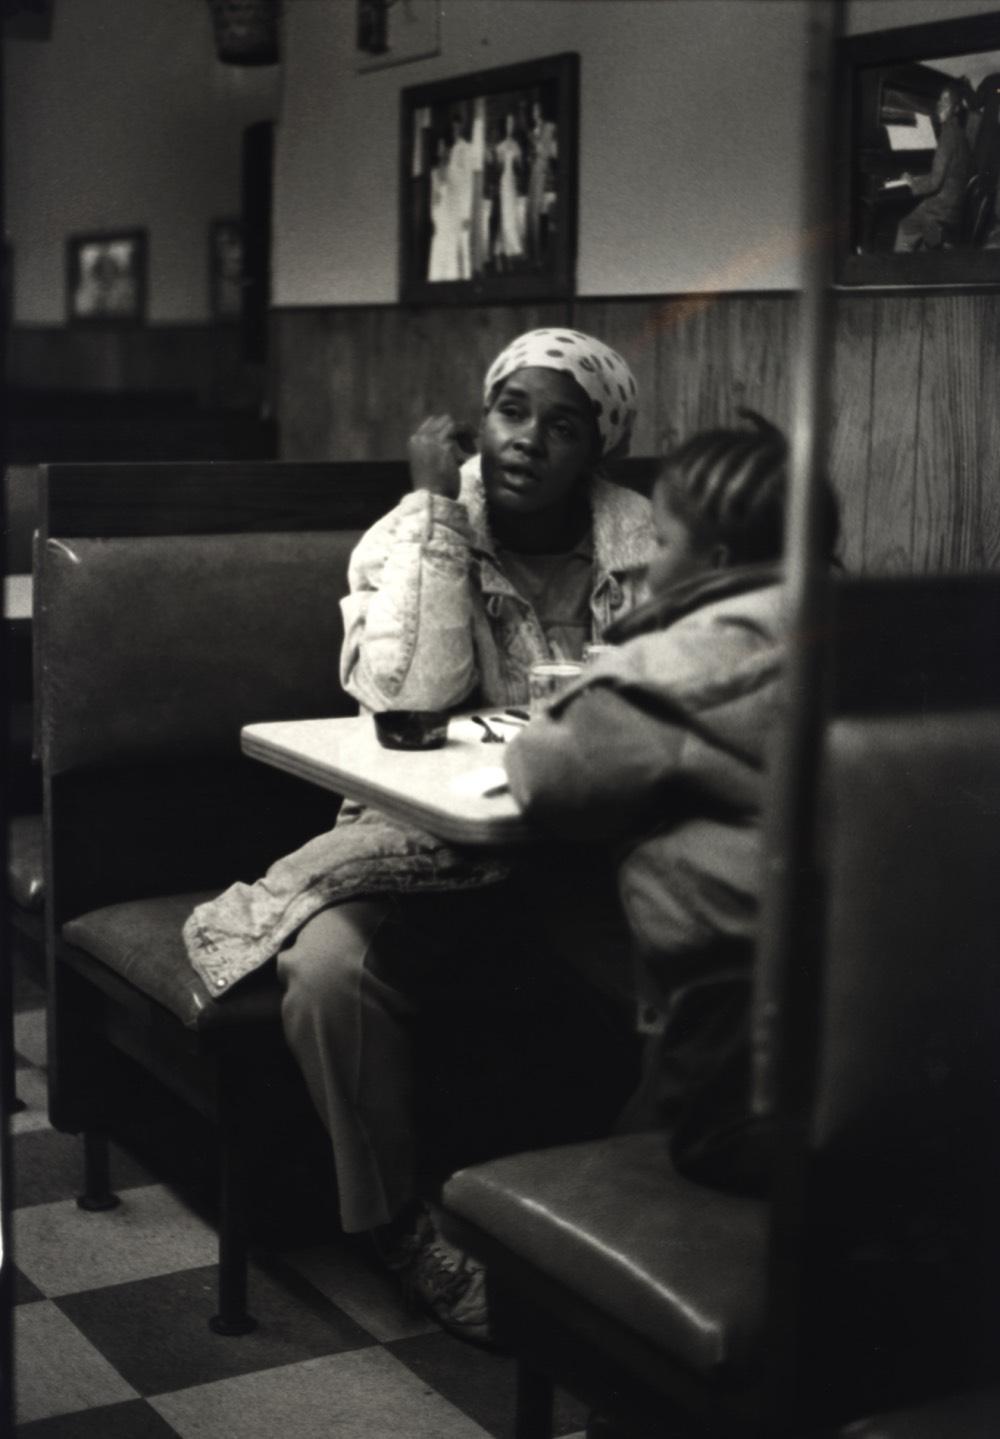 vystava-arthur-jaffa-praha-afroamericane-cernobila